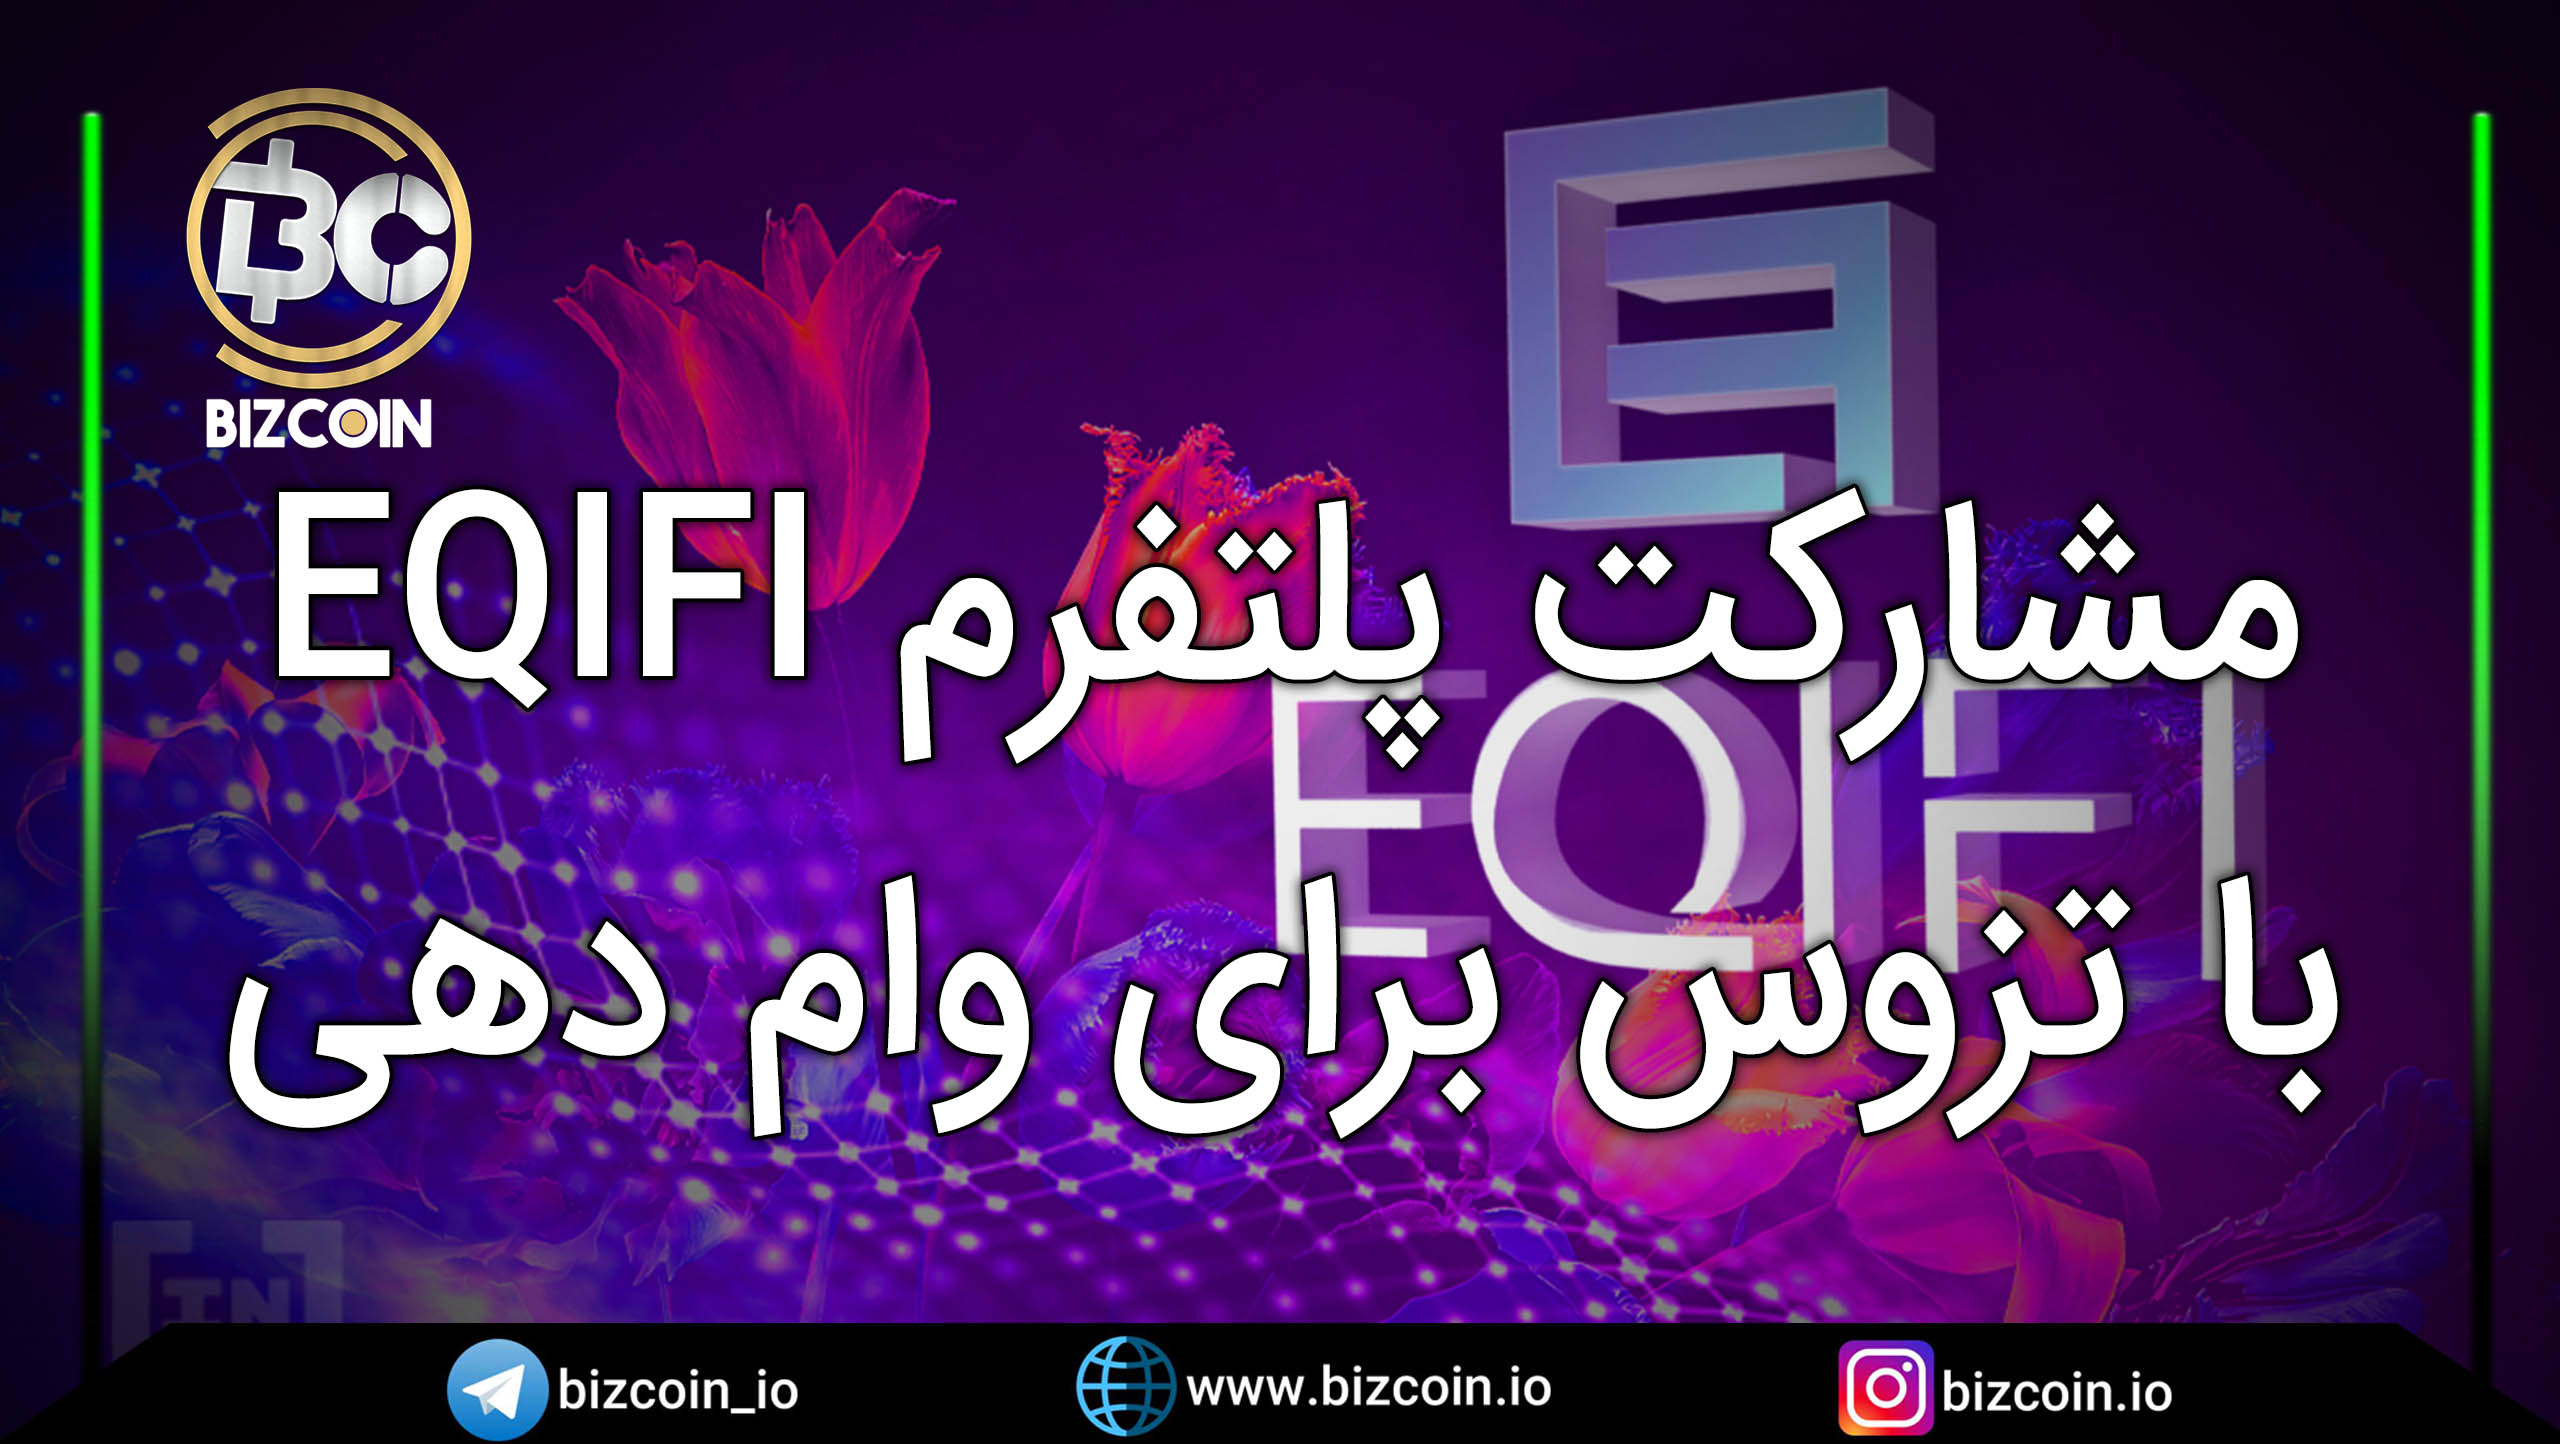 EQIFI platform partnership with tezos for lending مشارکت پلتفرم EQIFI با تزوس برای وام دهی